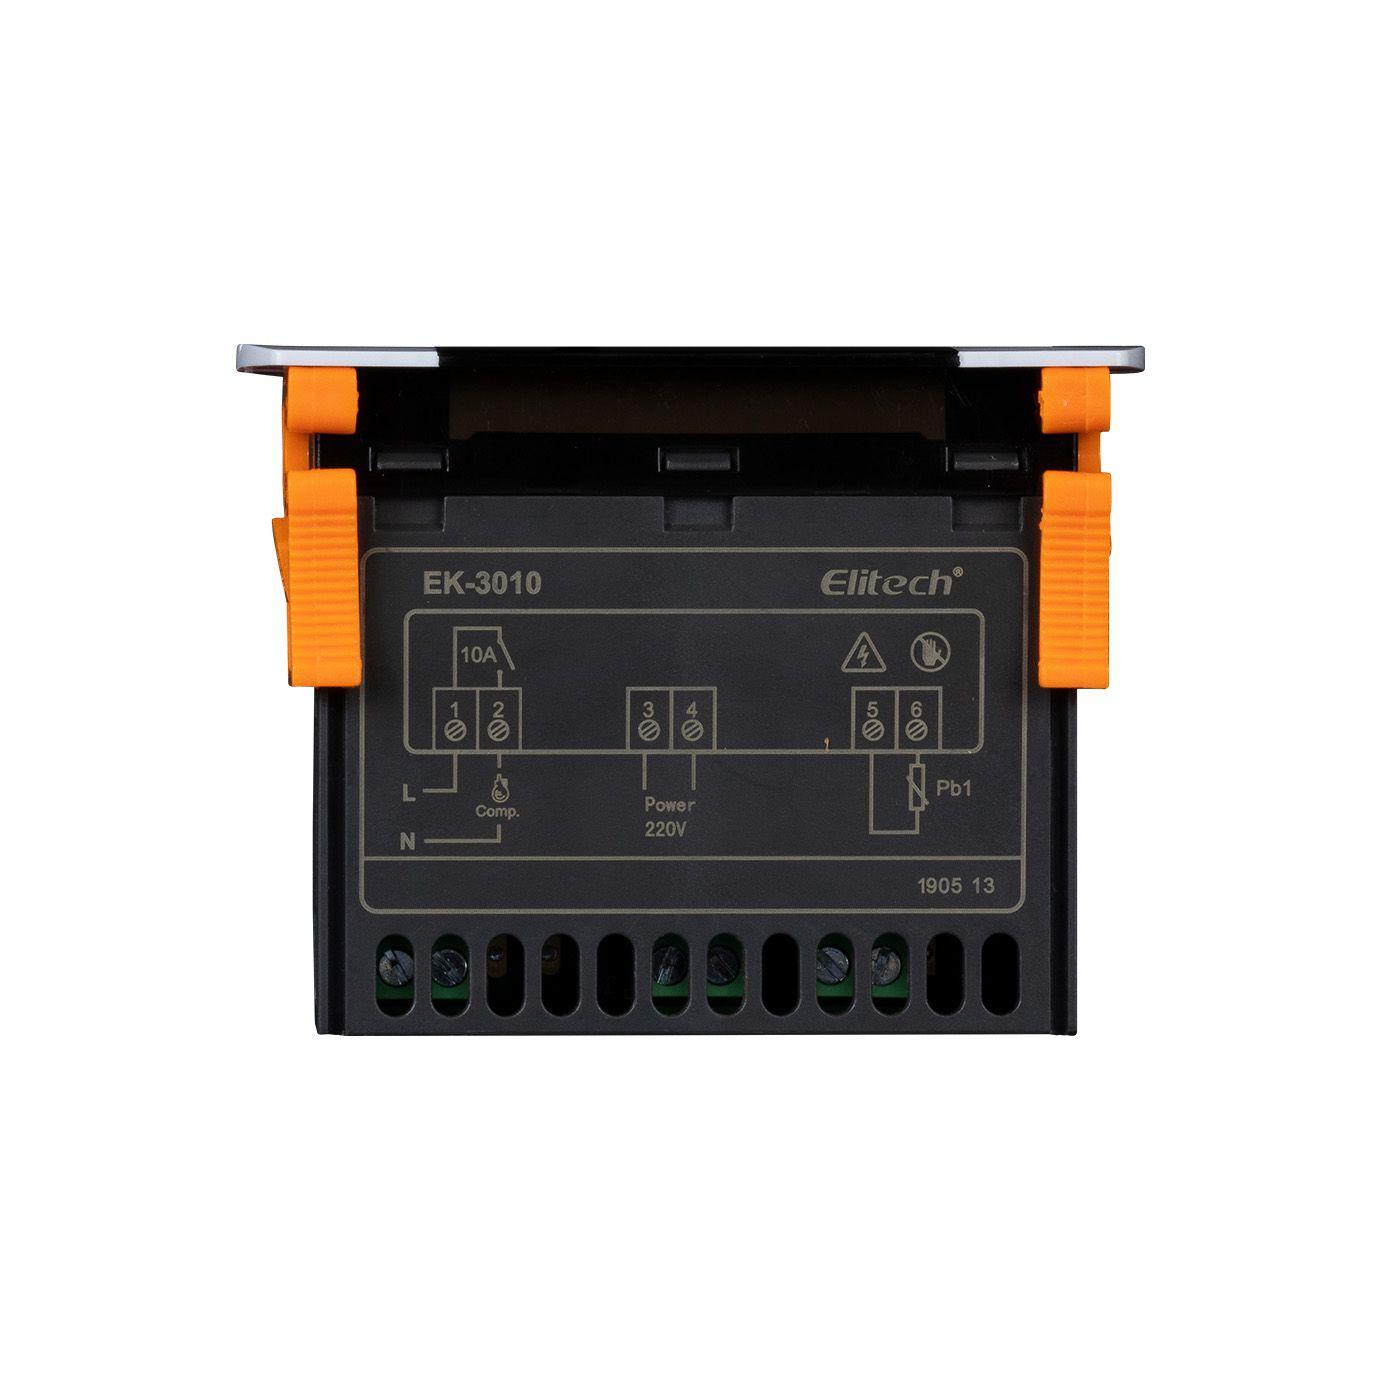 Controlador Digital de Temperatura / Termostato EK-3010 para Cerveja Artesanal